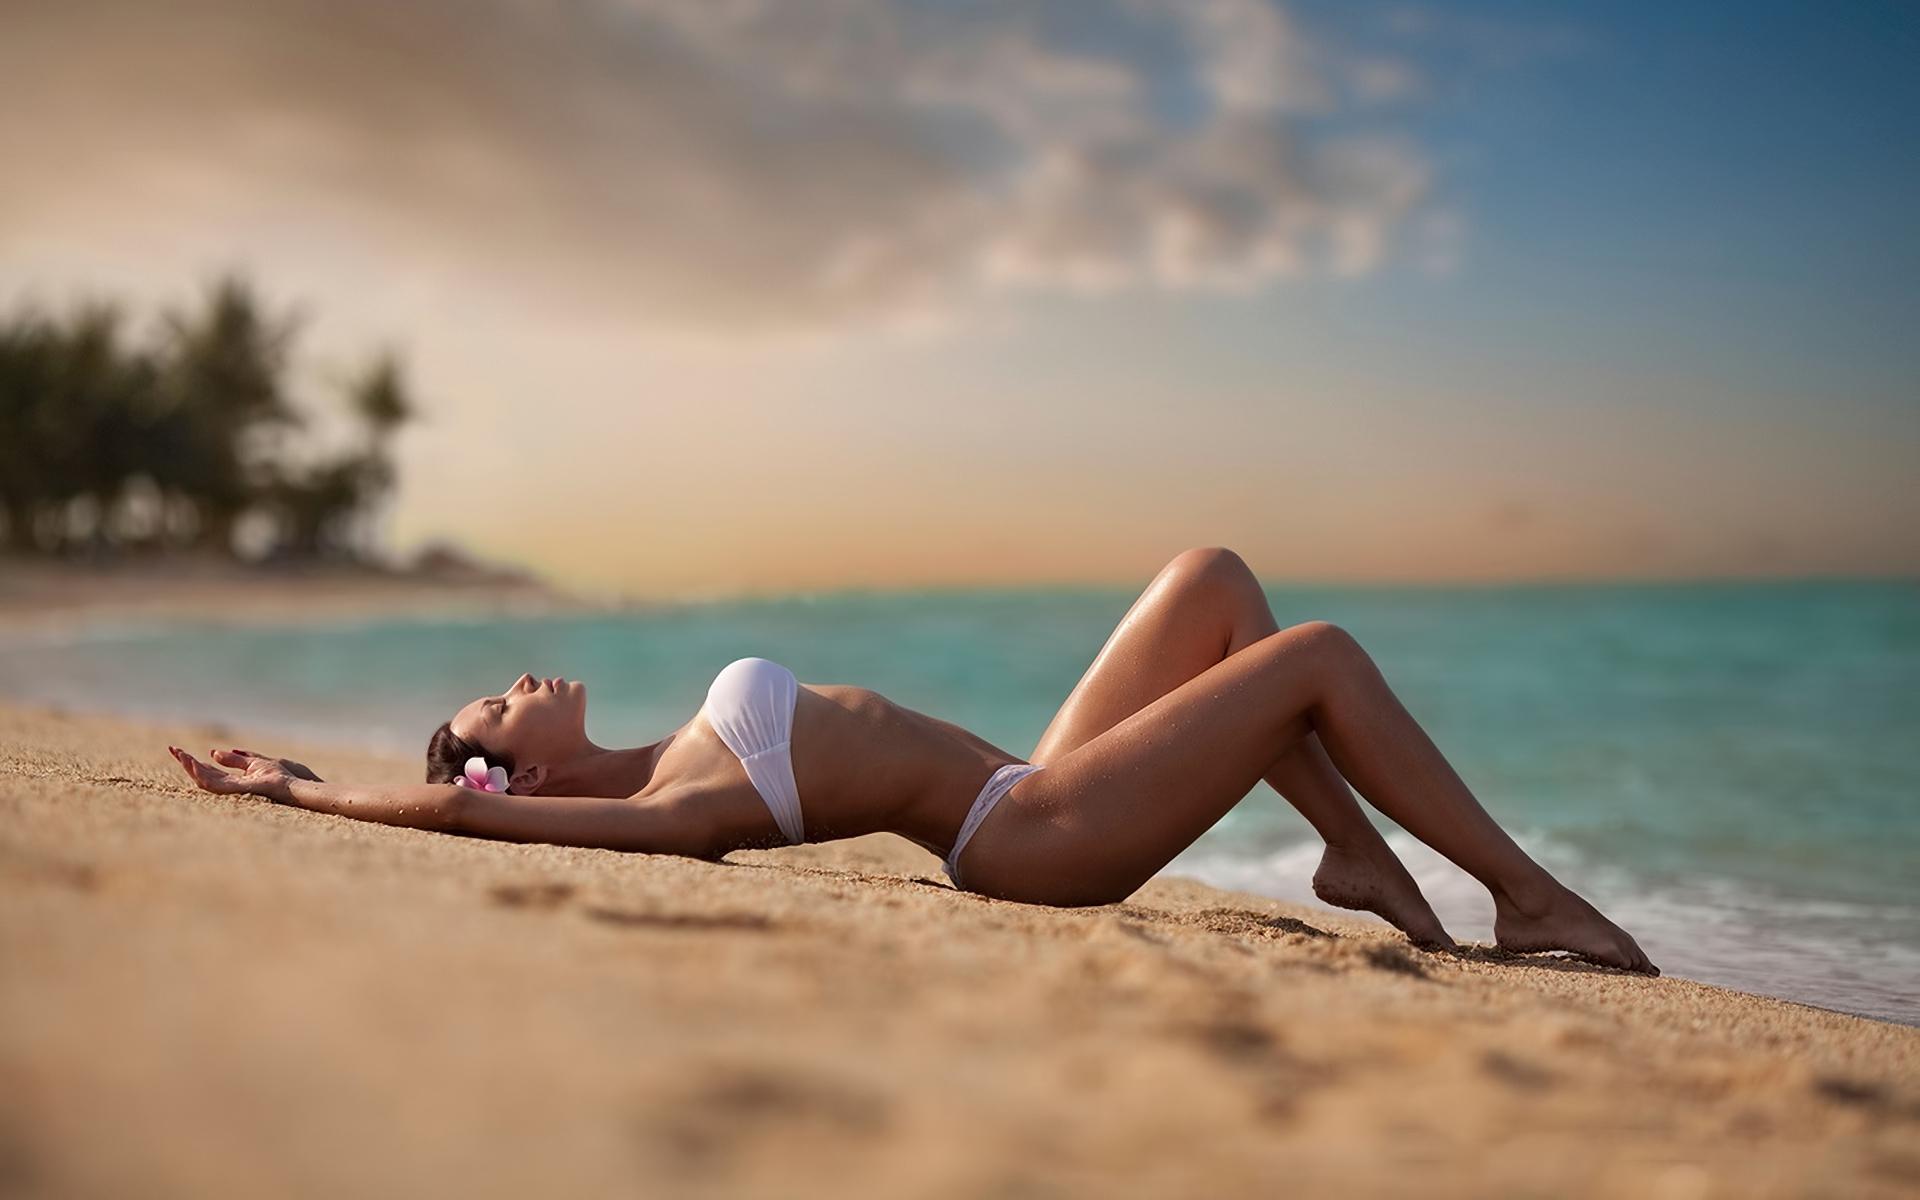 Фото член суне в піську 12 фотография